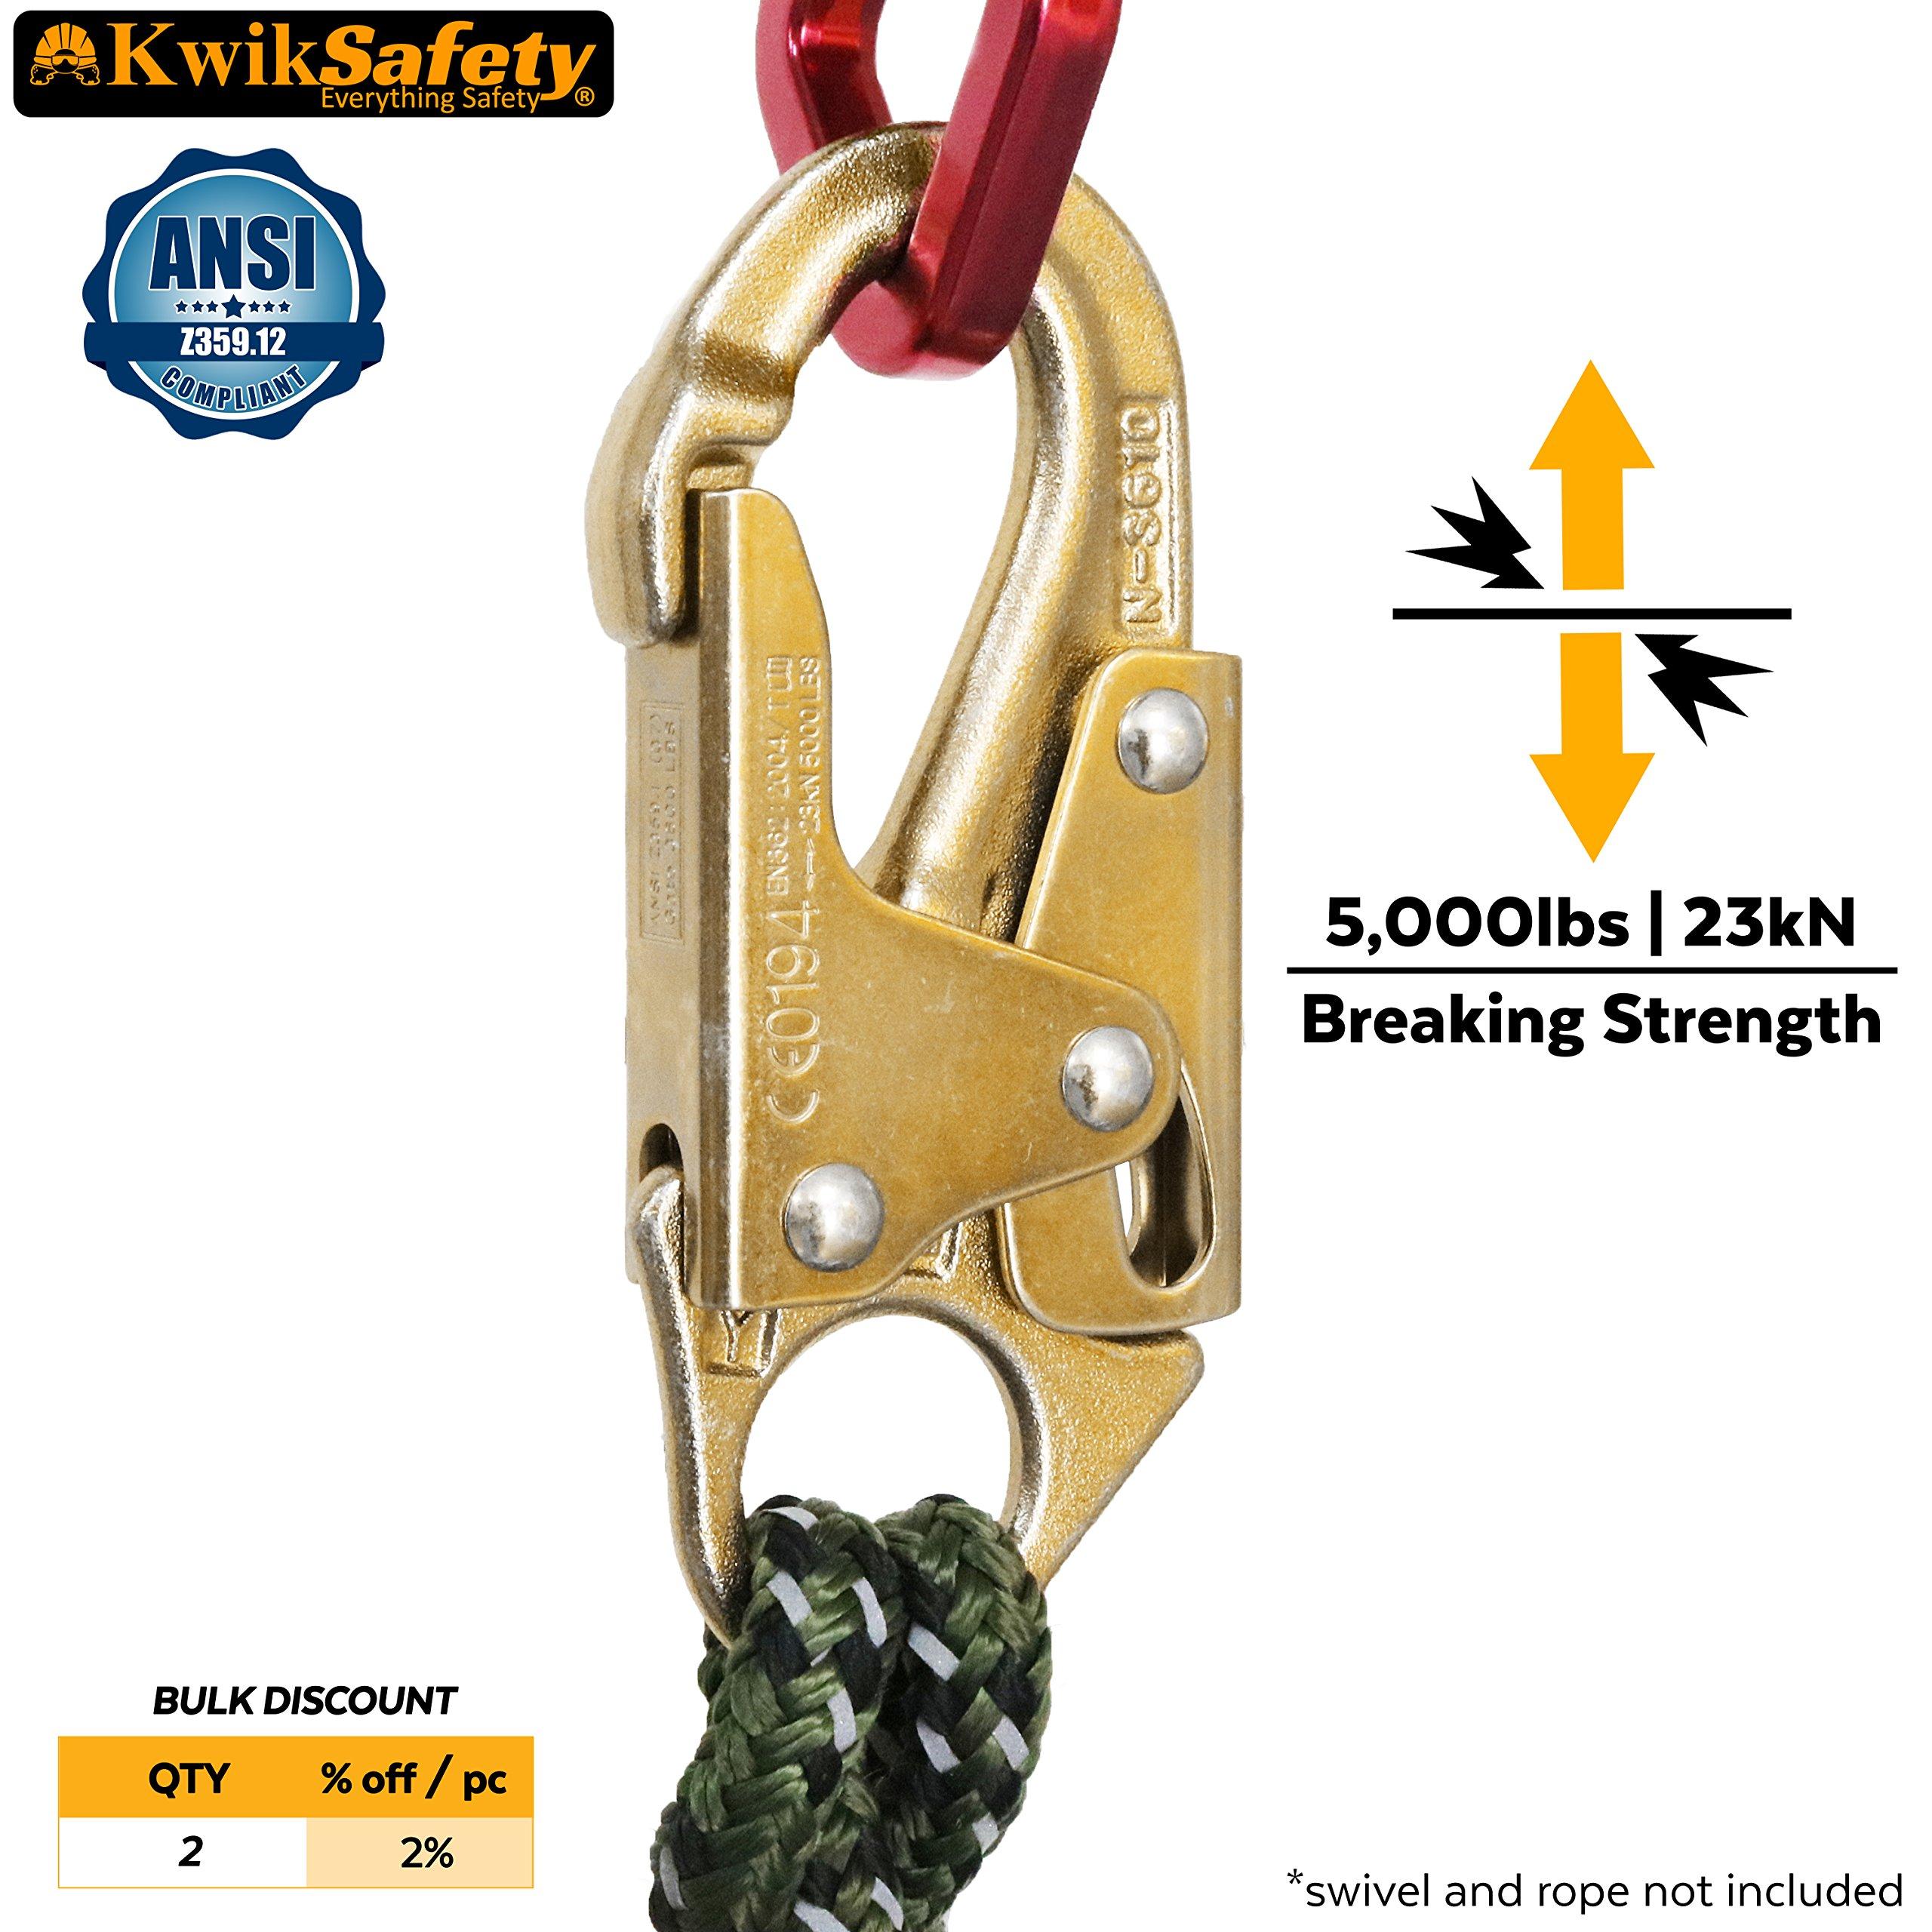 KwikSafety BOND | N-3610 Yoke ANSI Compliant Double Lock Snap Hook | Heavy Duty Heat Treated Forged Steel Connector | Personal Fall Arrest Industrial Construction Utility Hardware | 5,000lbs (23kN)